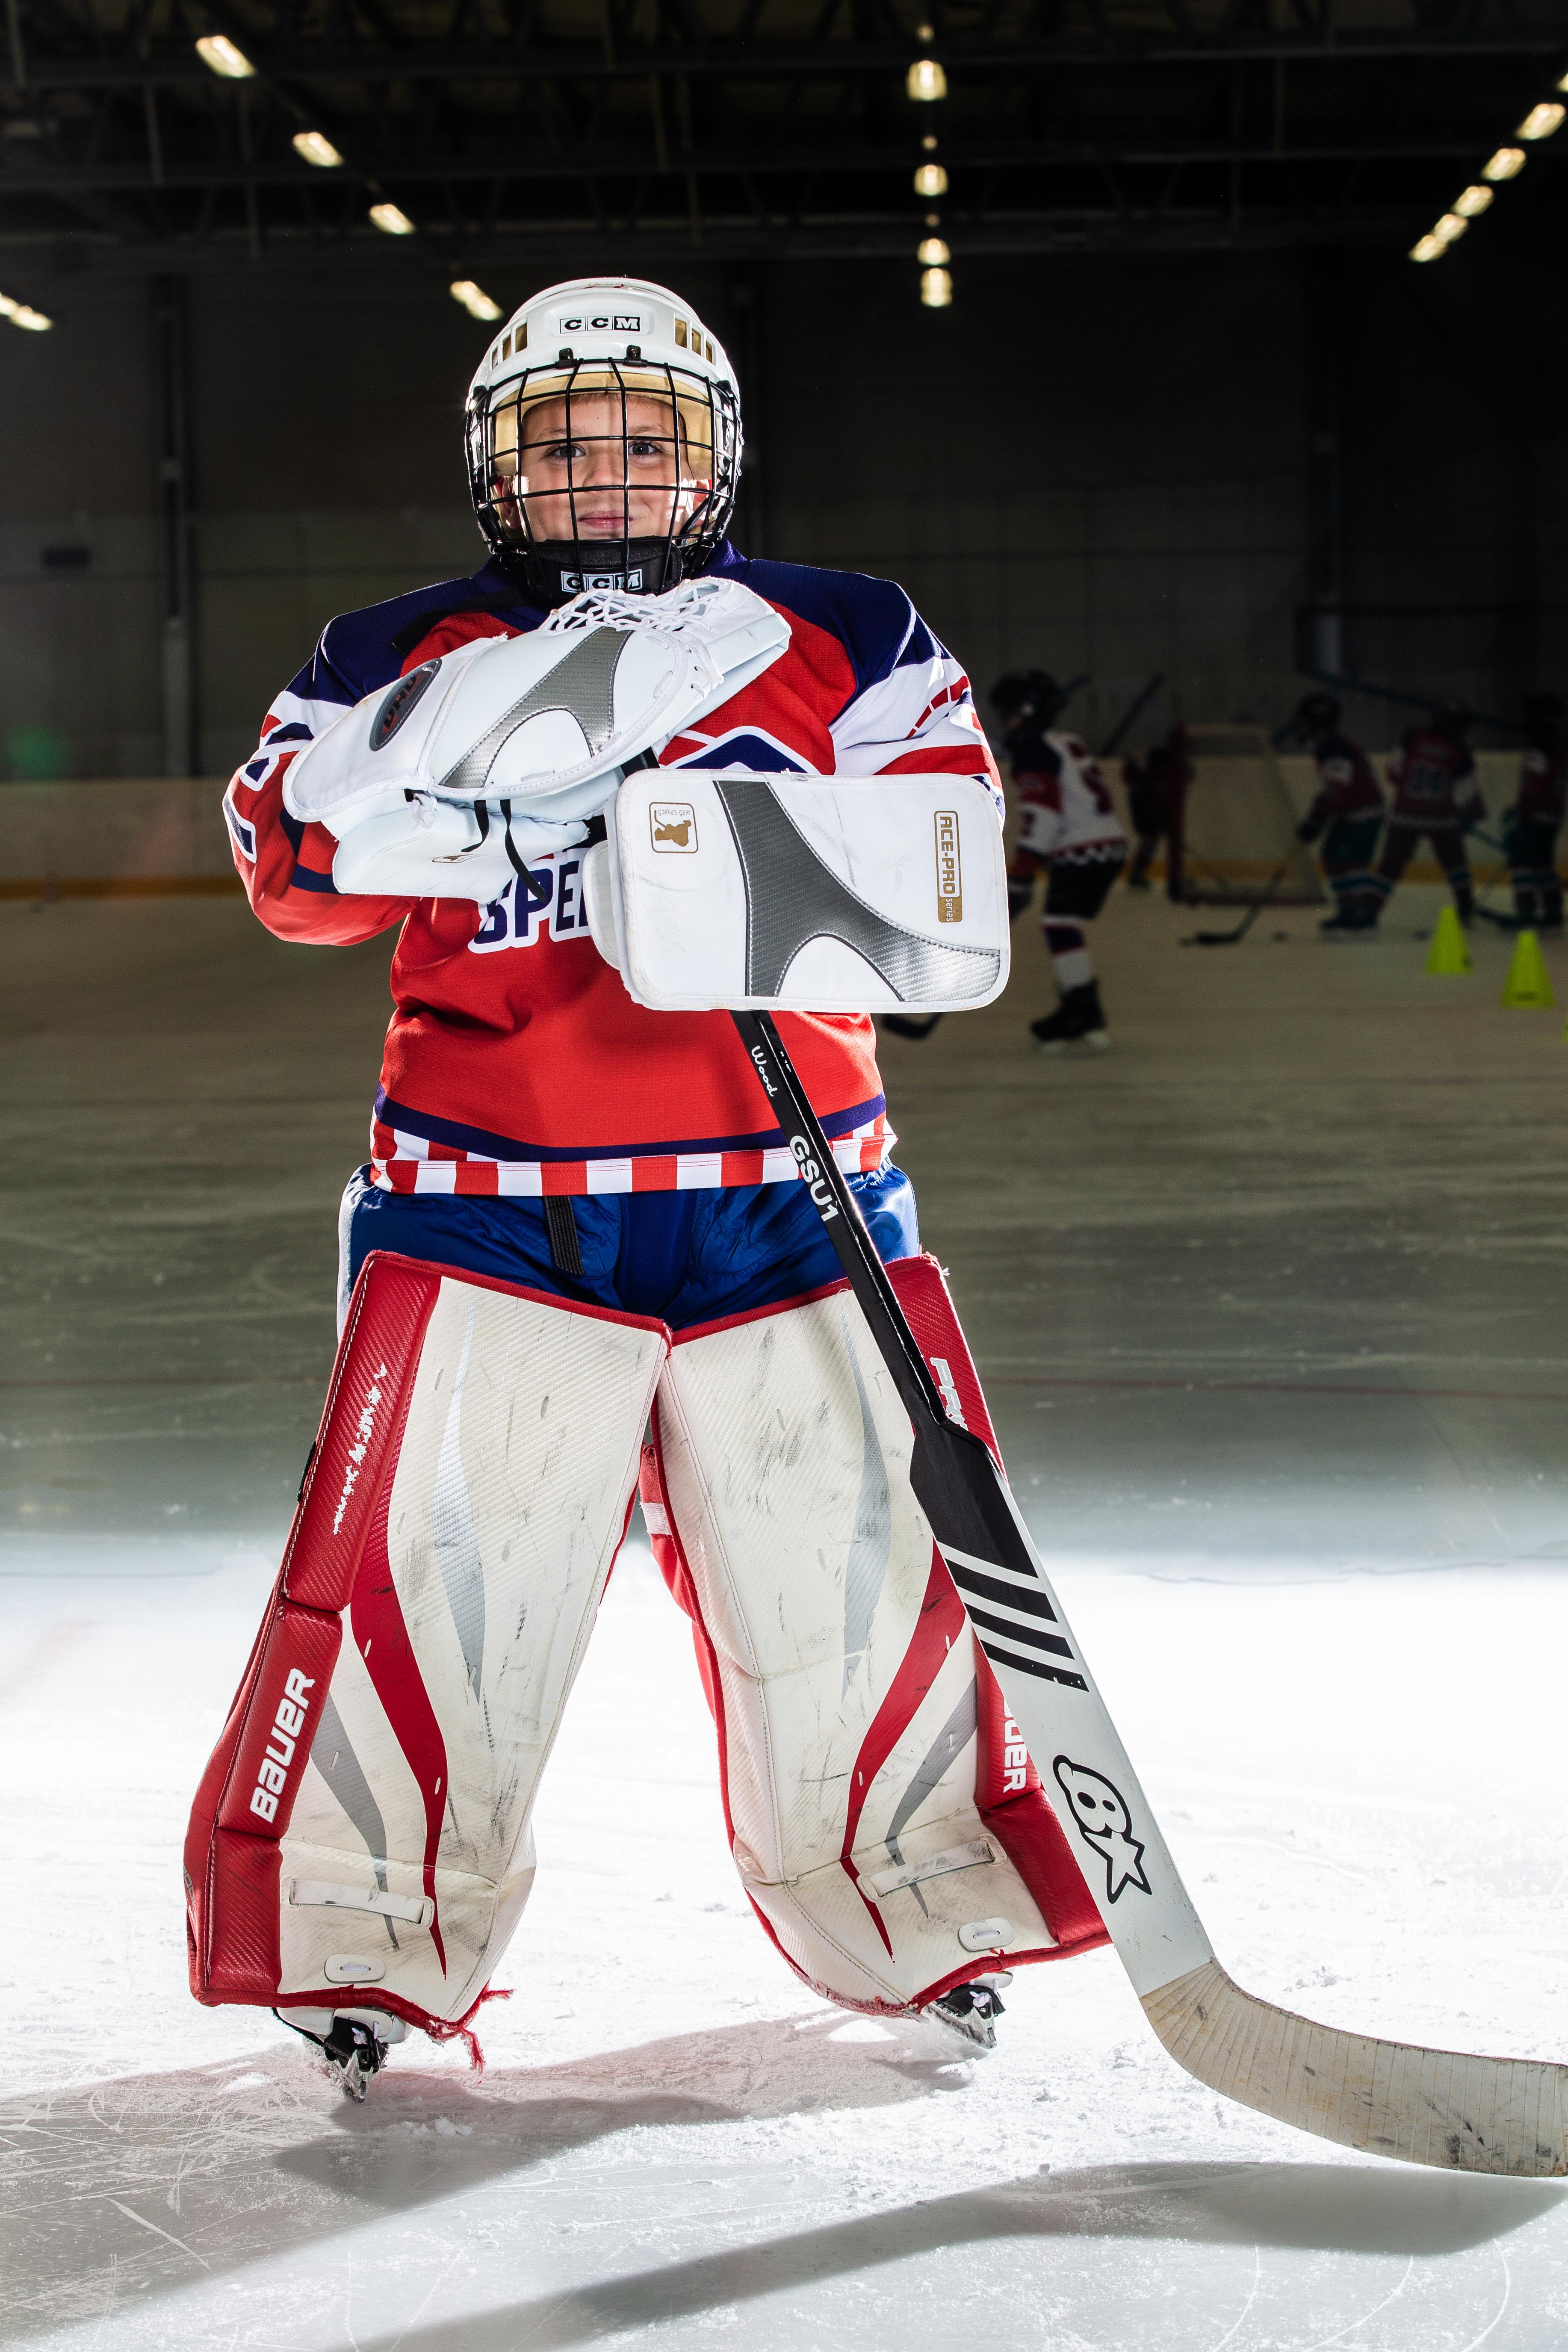 Adam Strihovsky Speeders Bratislava cislo 77 hokej